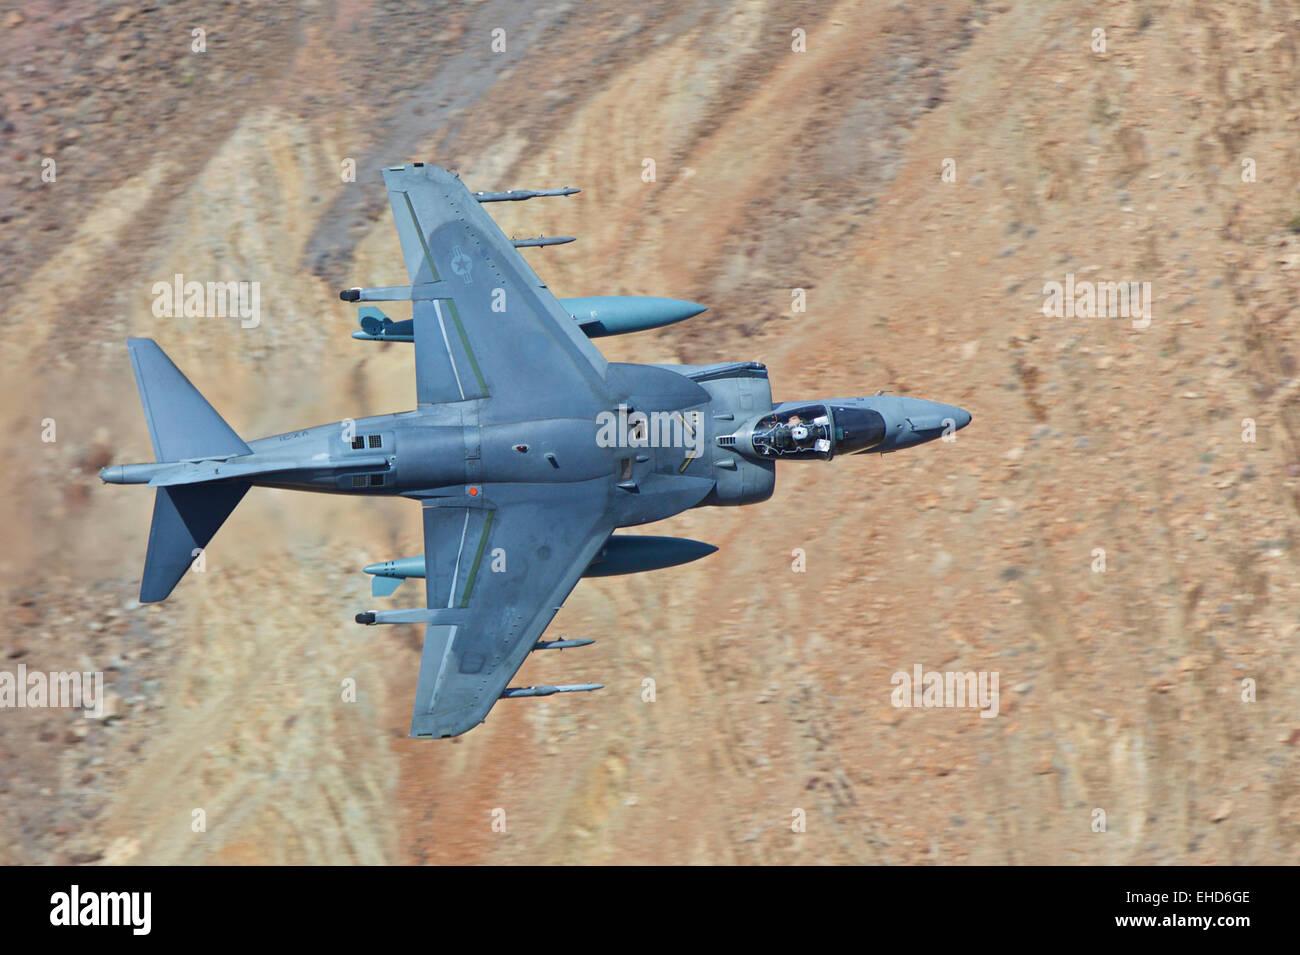 Marine Corps AV-8B Harrier II, Turning Hard As It Flies Low Through A Desert Canyon In The Mojave Desert, California, Stock Photo